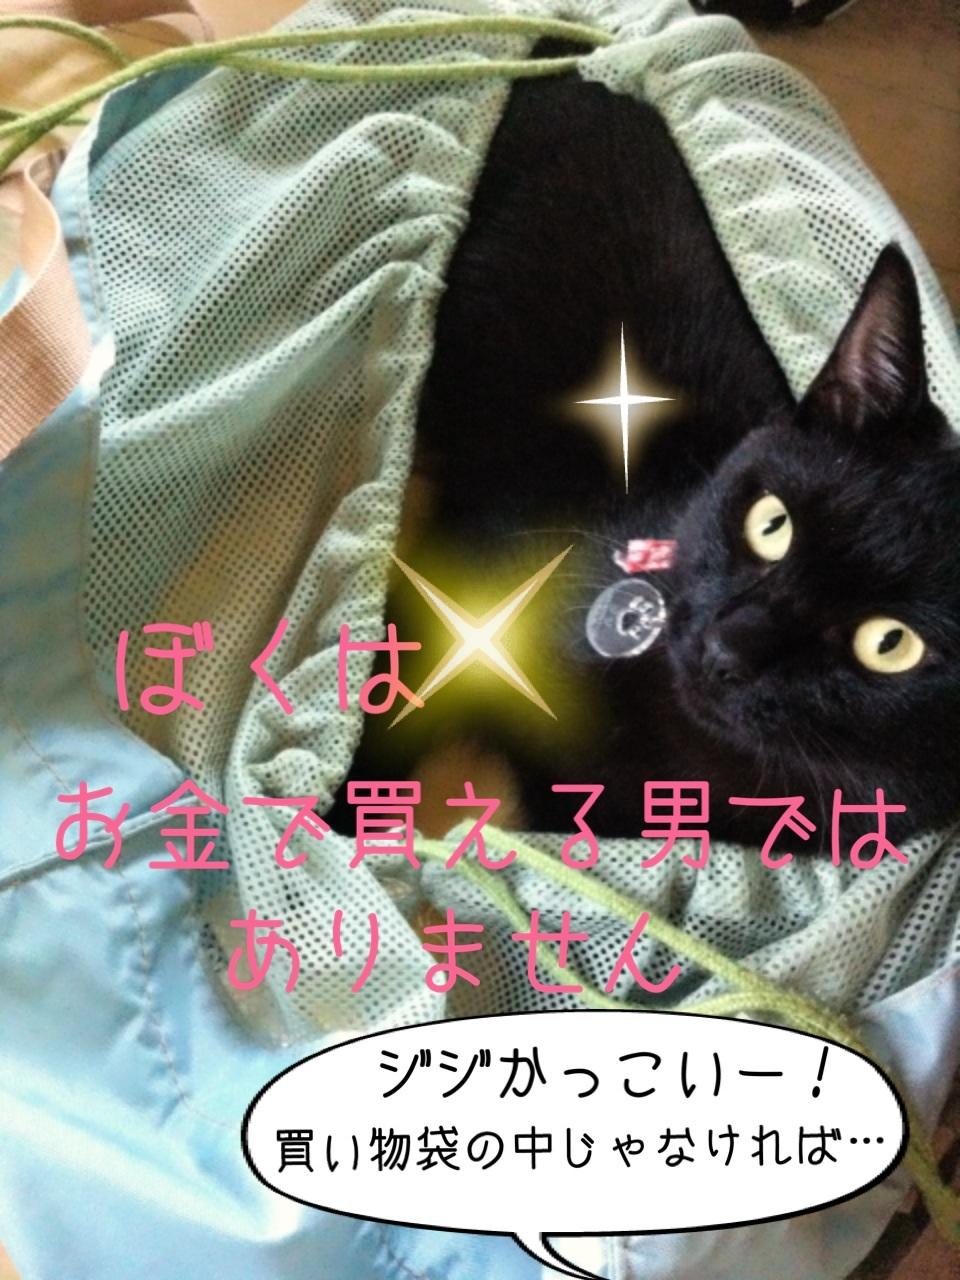 image_20130818194919edf.jpg